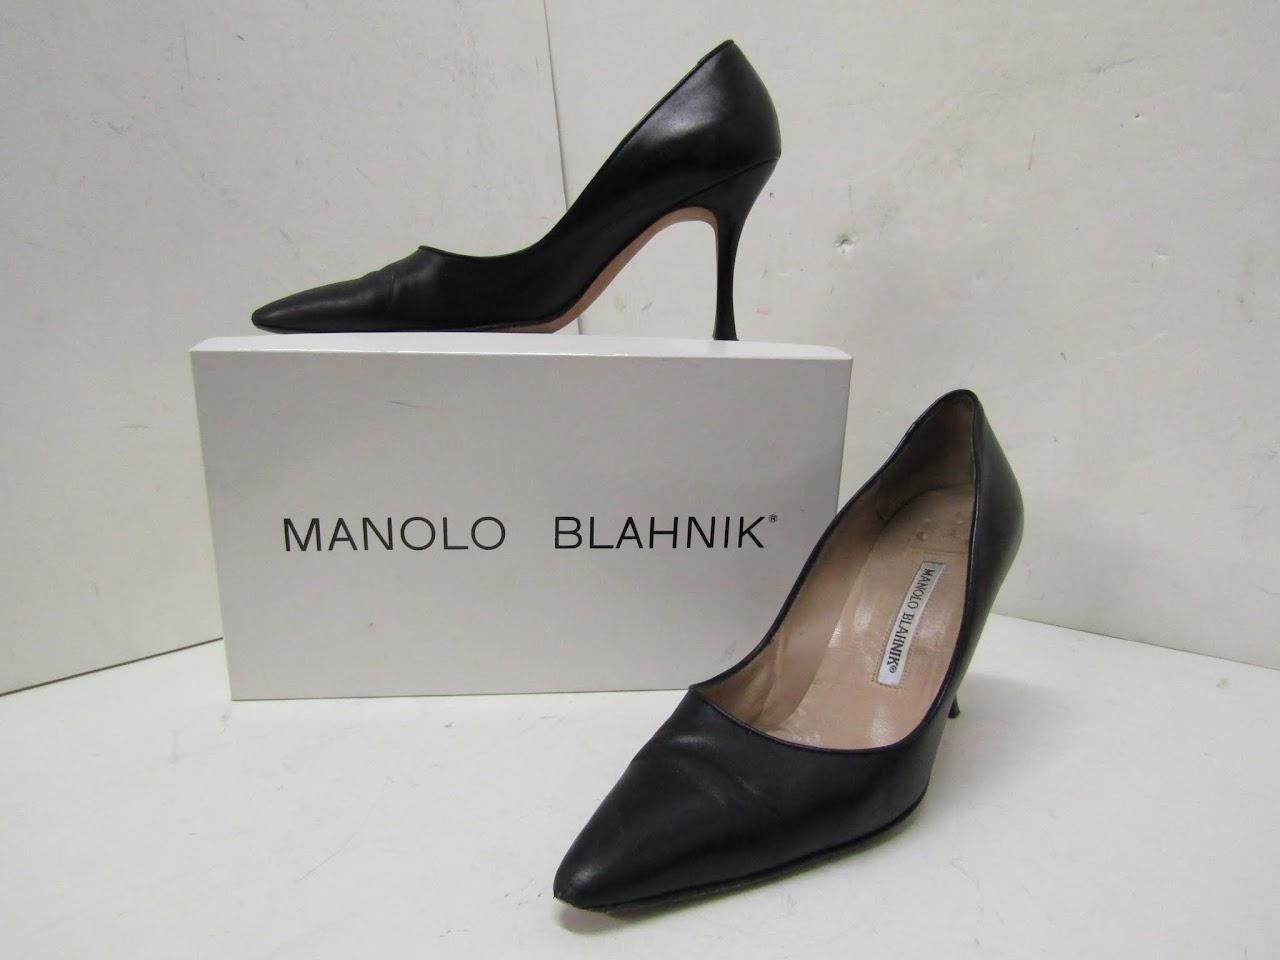 Manolo Blahnik Stilettos